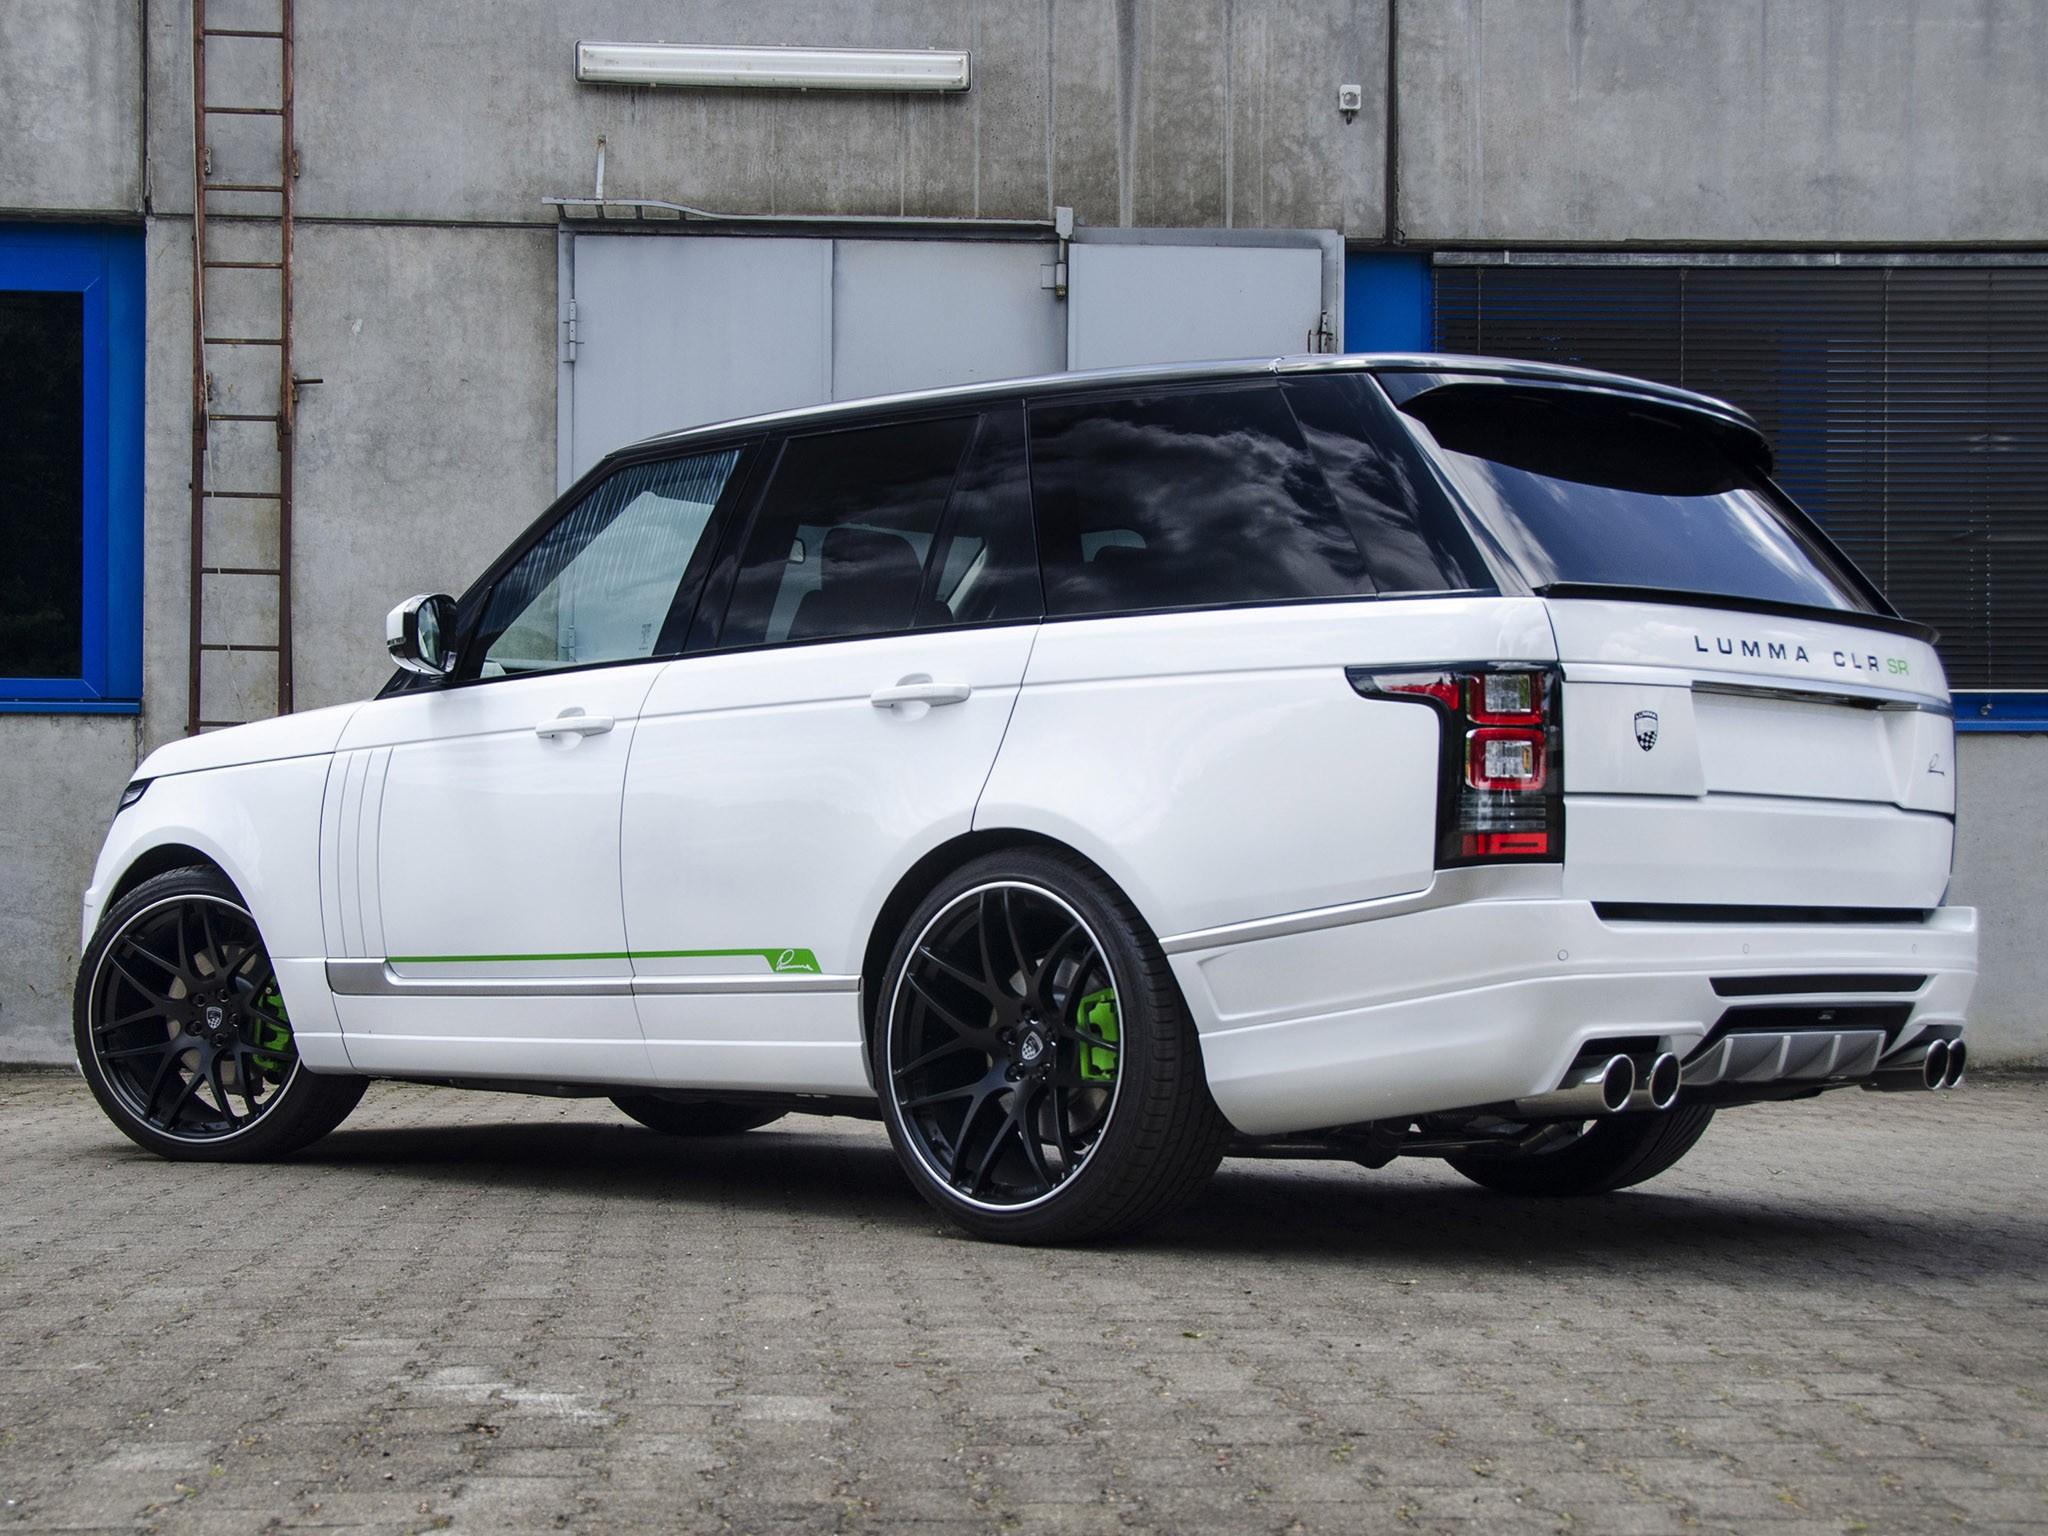 2014 Lumma Design - Range Rover Vogue CLR SR